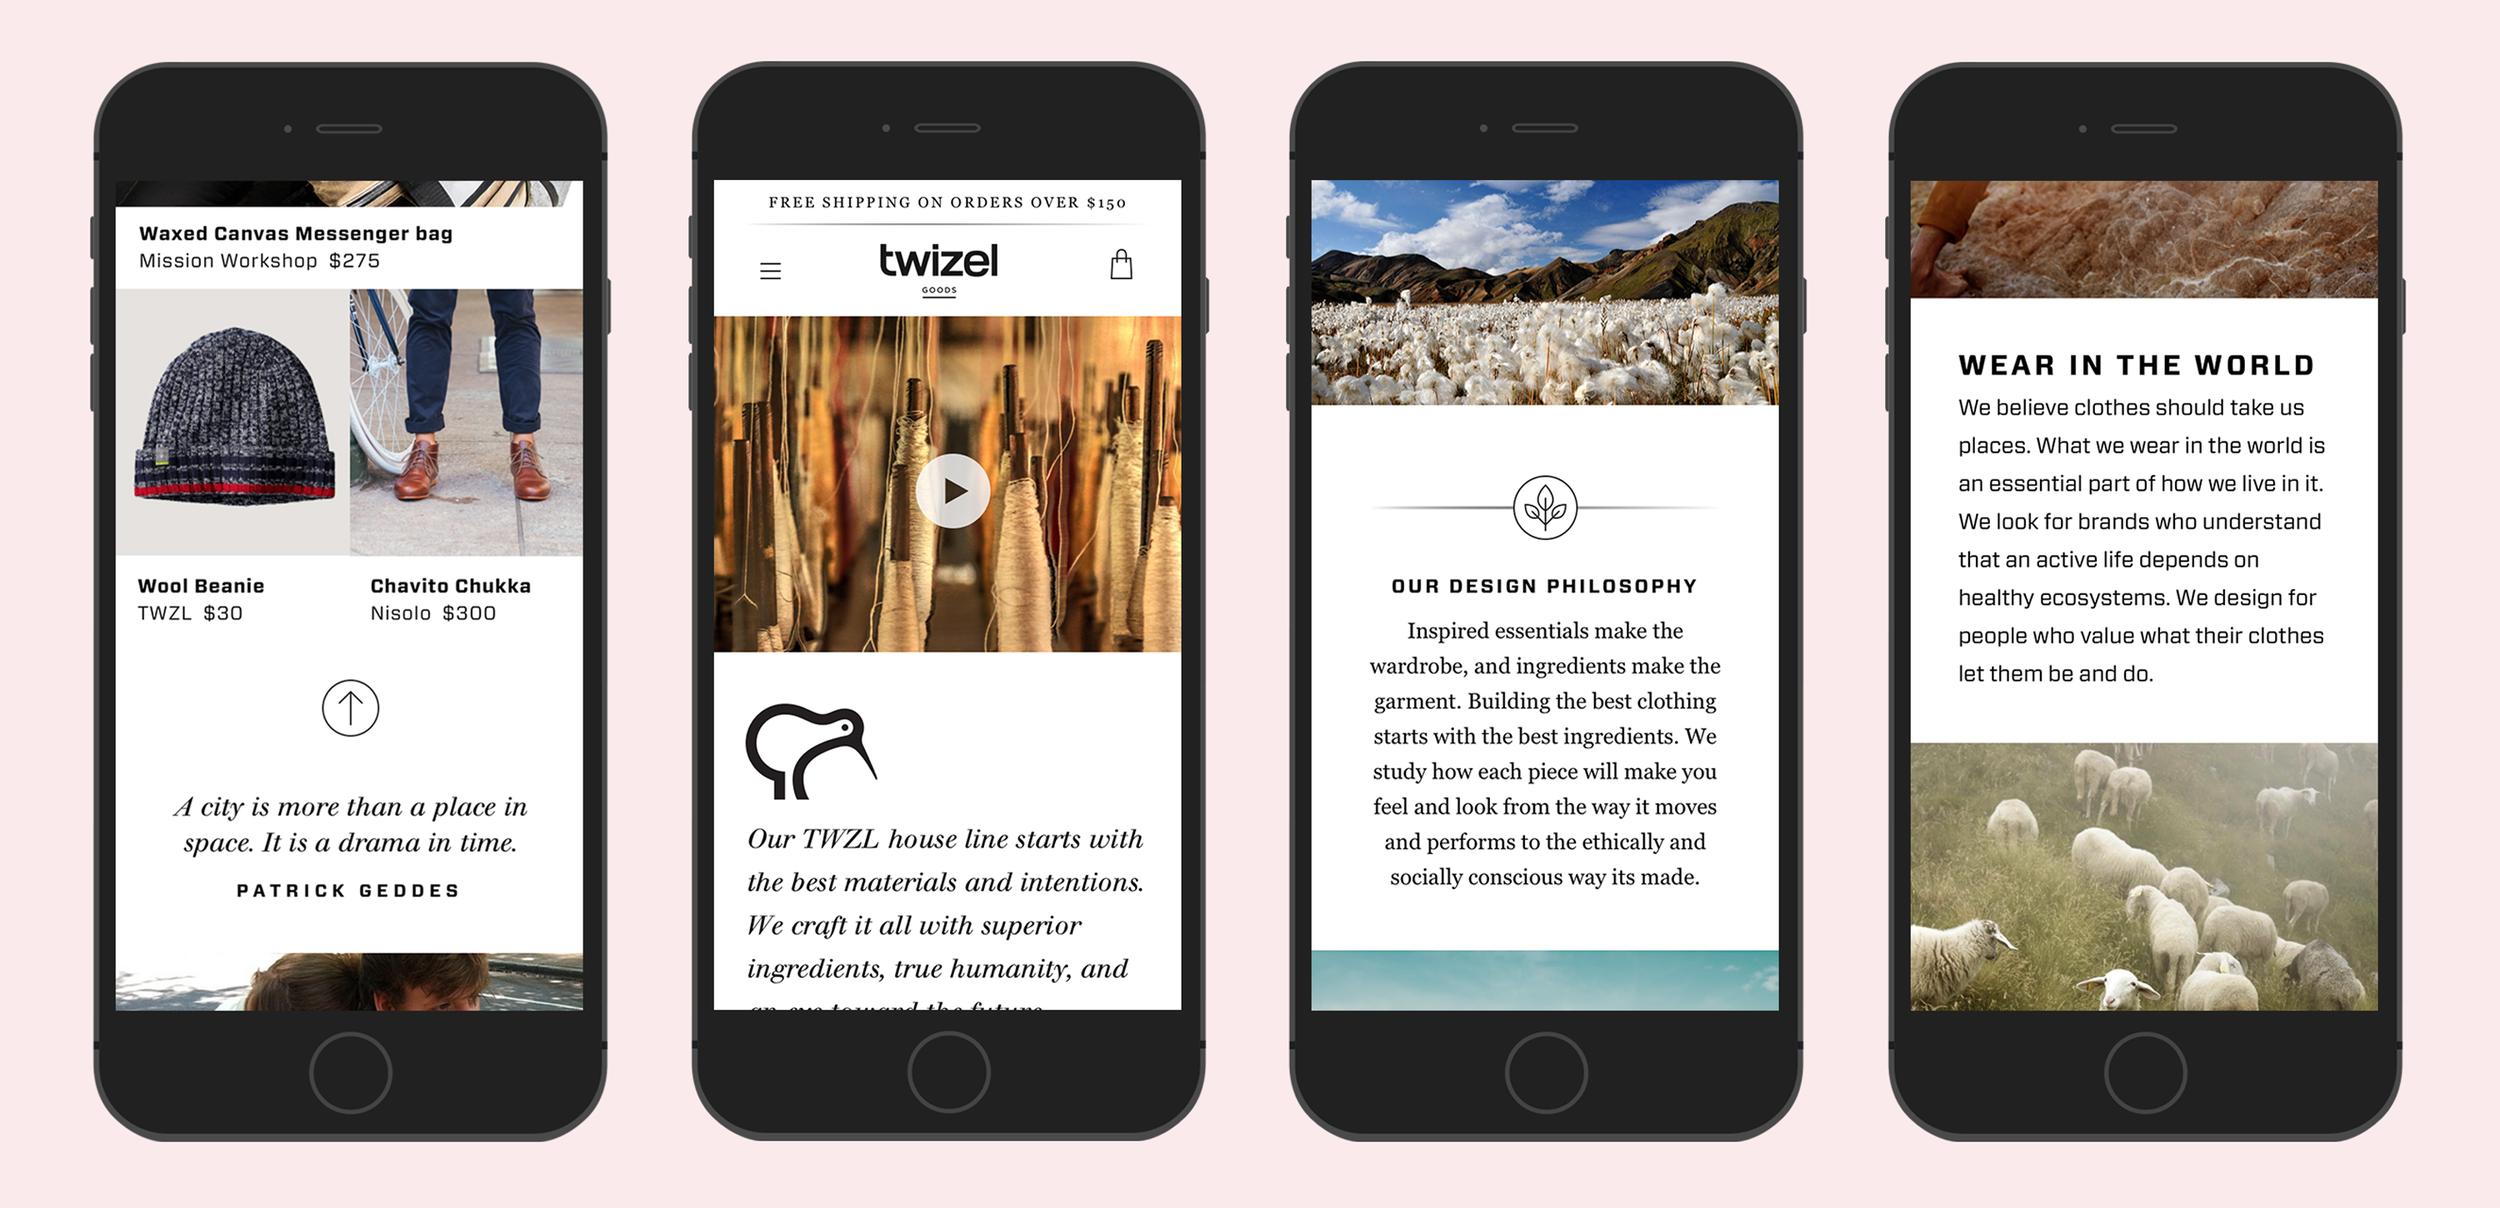 twizel-mobile-screens-2.png